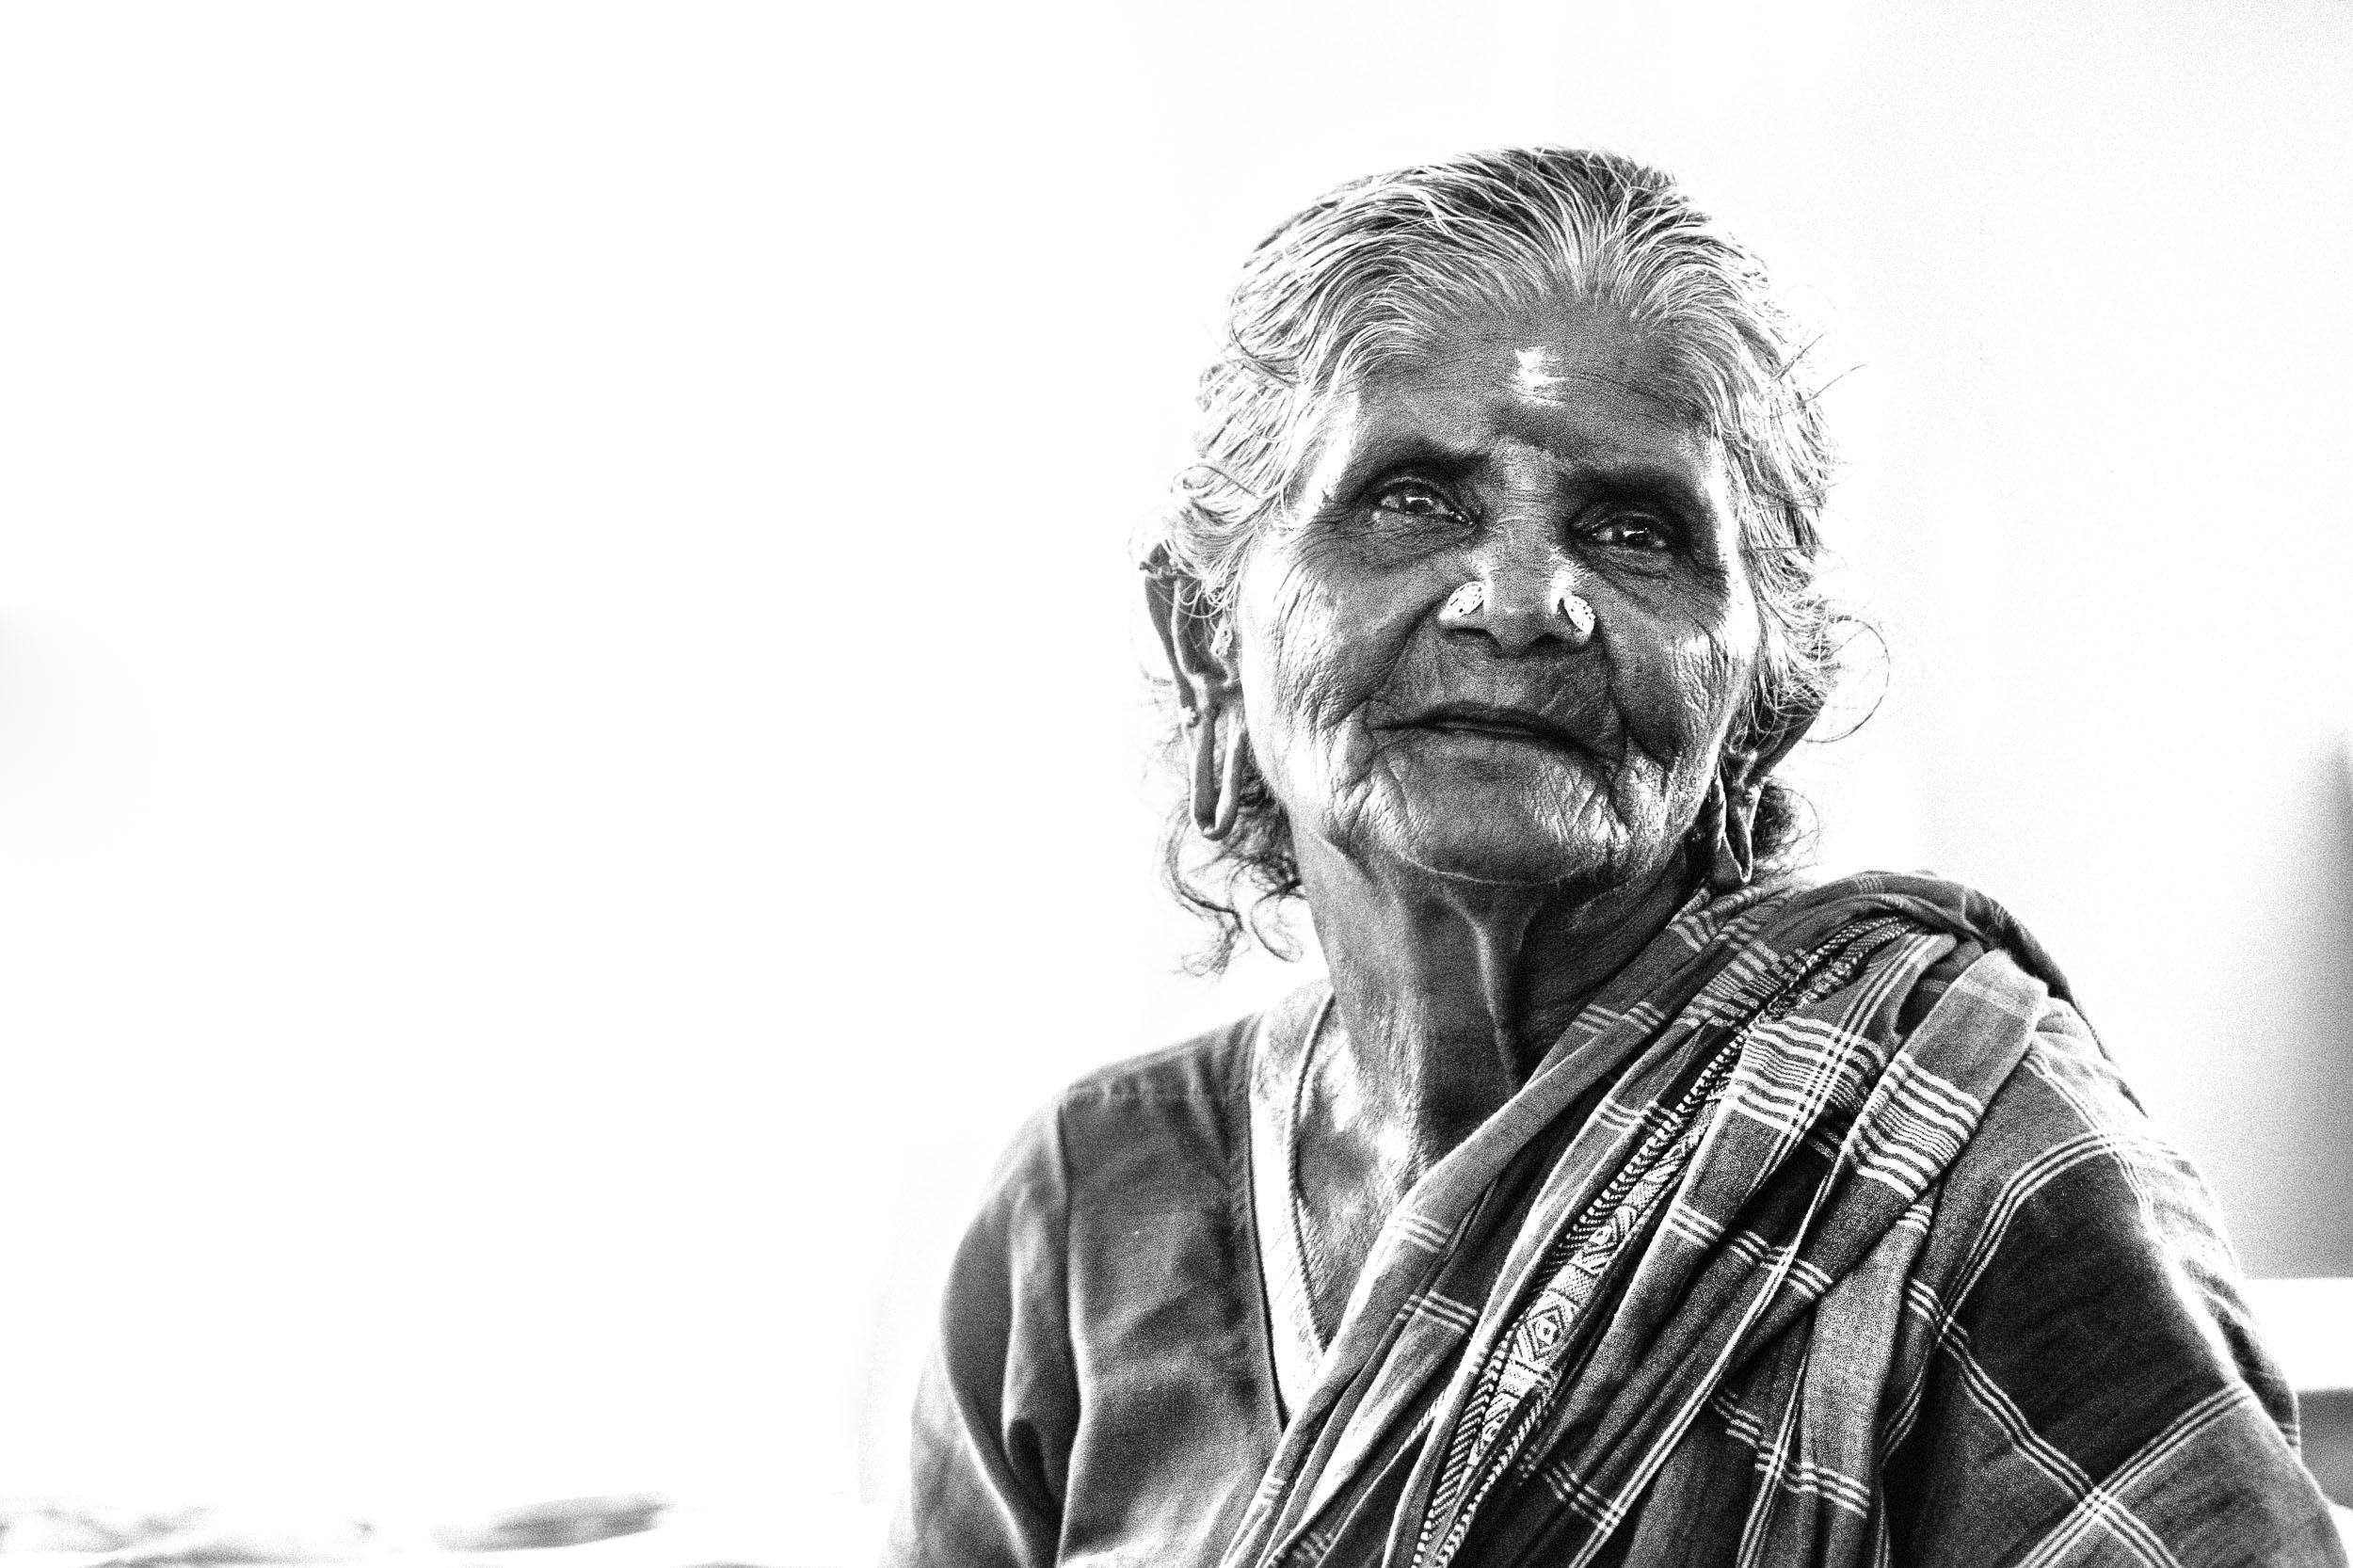 brian-callaway-india-photography-aravind-eye-hospital-32.jpg